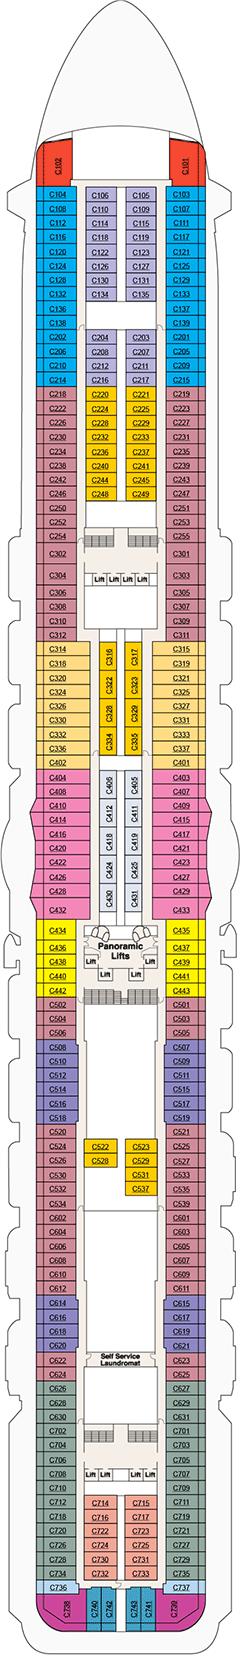 Deck plan m s sky princess unlimited validity for 8 x 10 deck plans